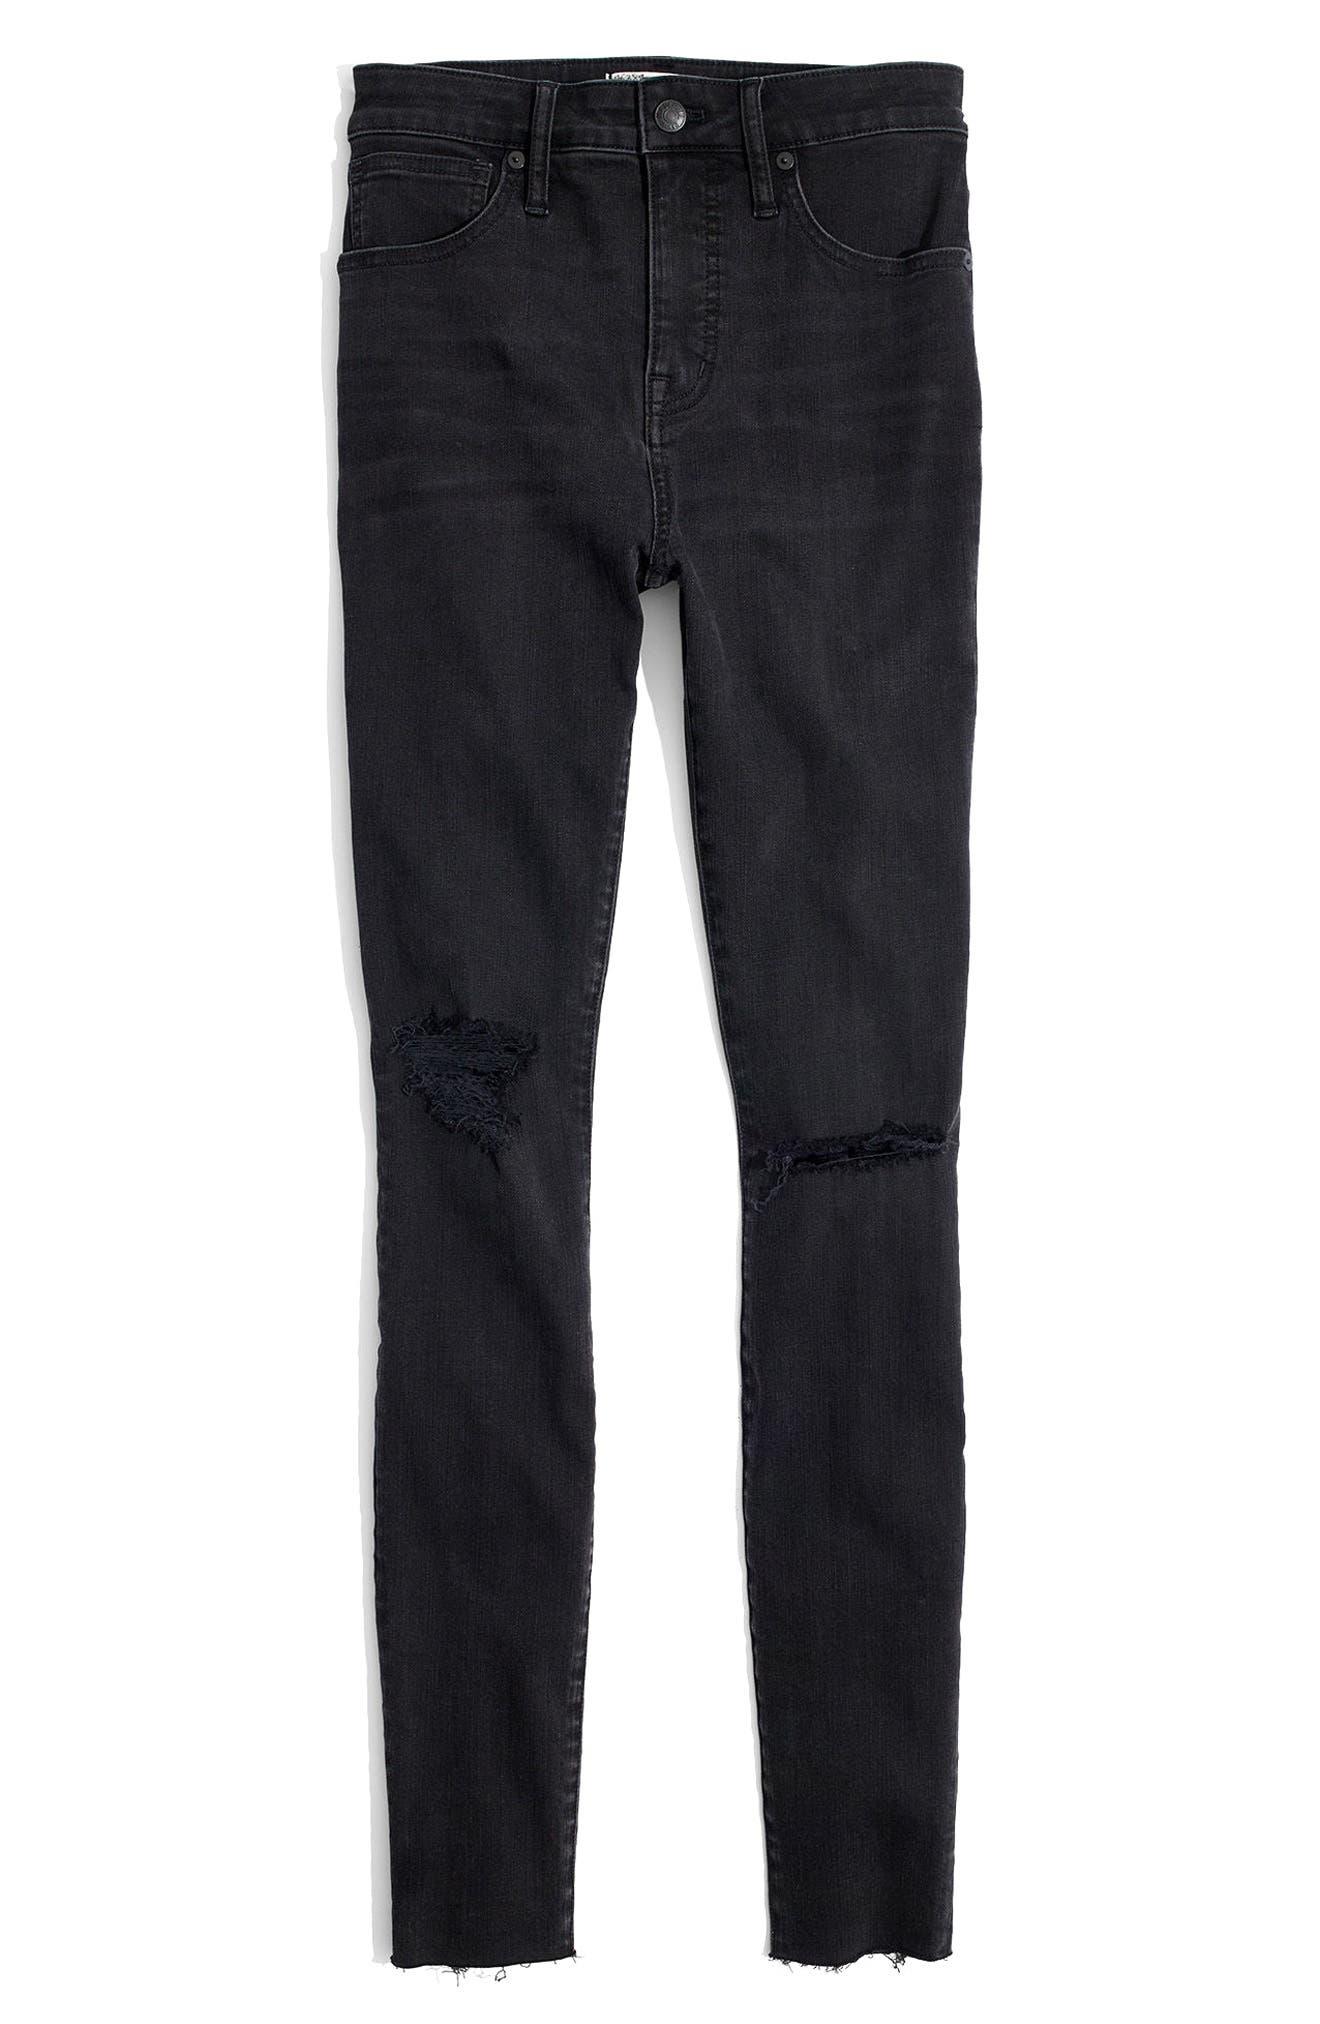 Curvy High Waist Skinny Jeans,                             Alternate thumbnail 6, color,                             Black Sea